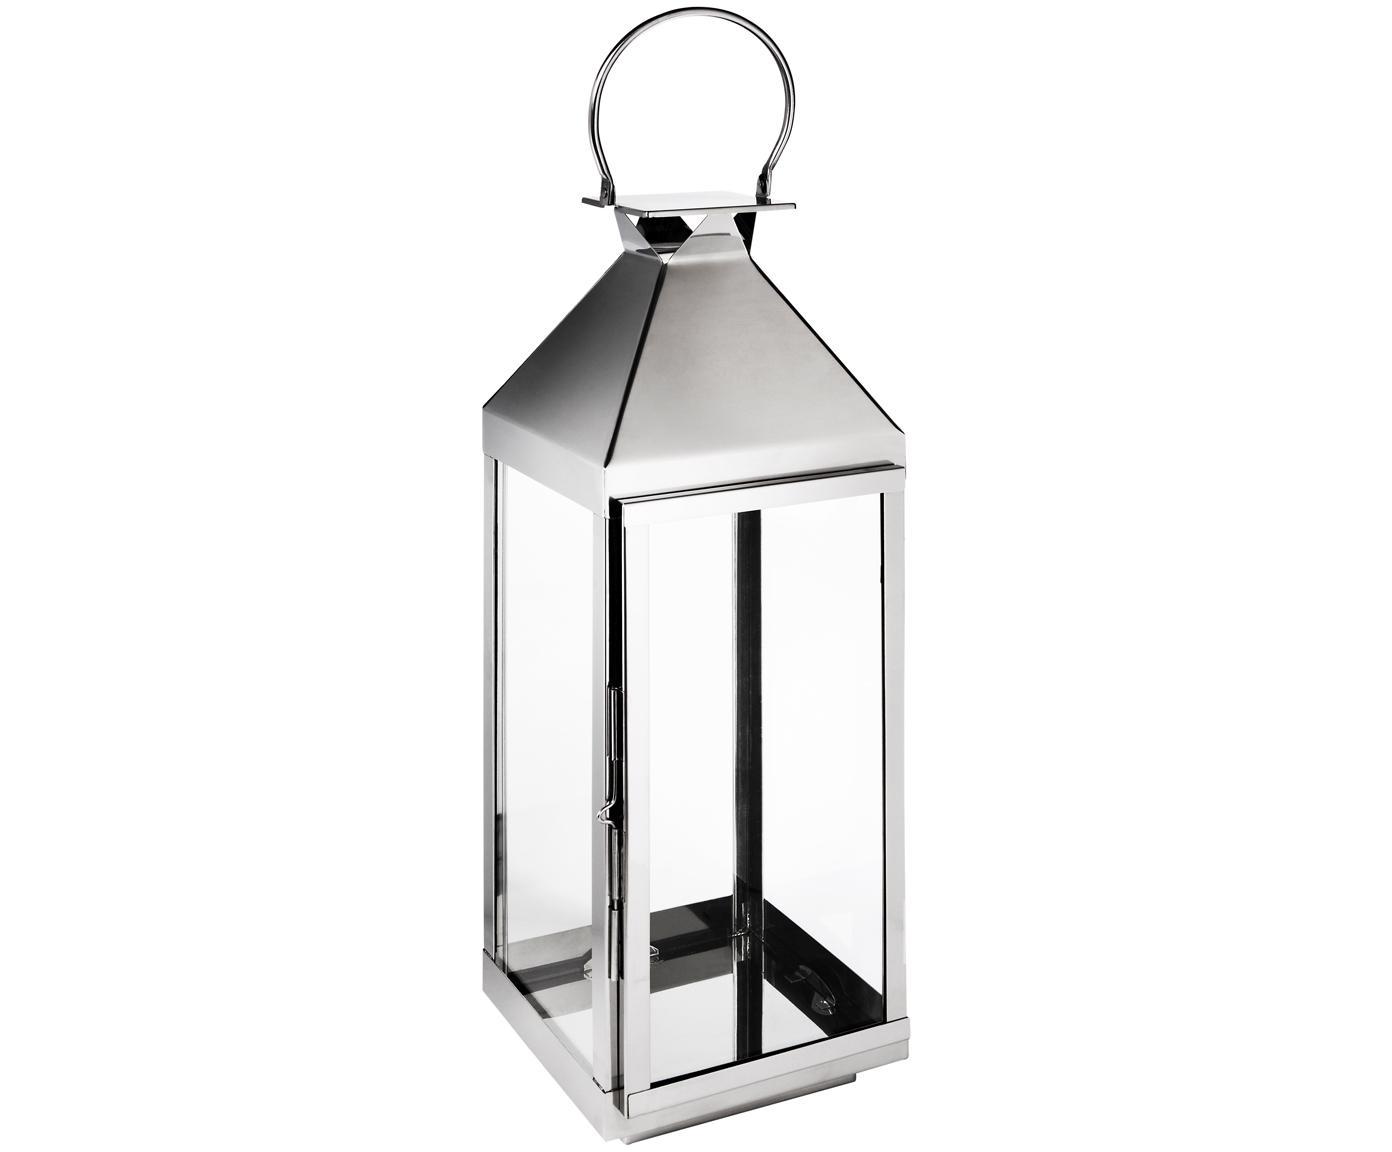 Laterne Grace, Hochglanzpolierter Edelstahl, Glas, Edelstahl, H 60 cm